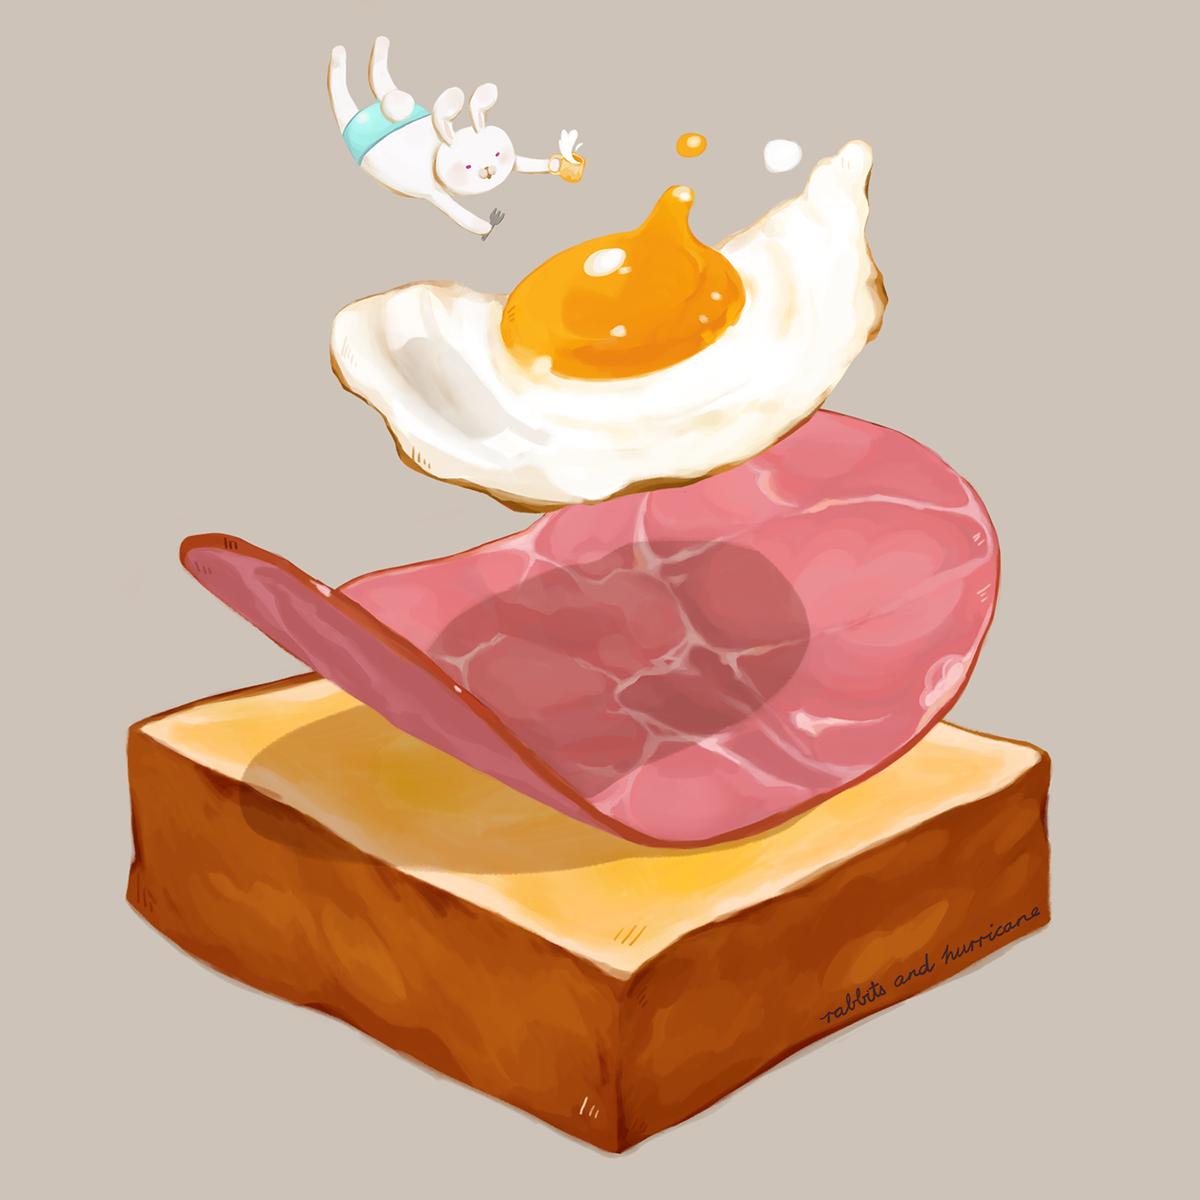 Image may contain: food and cartoon